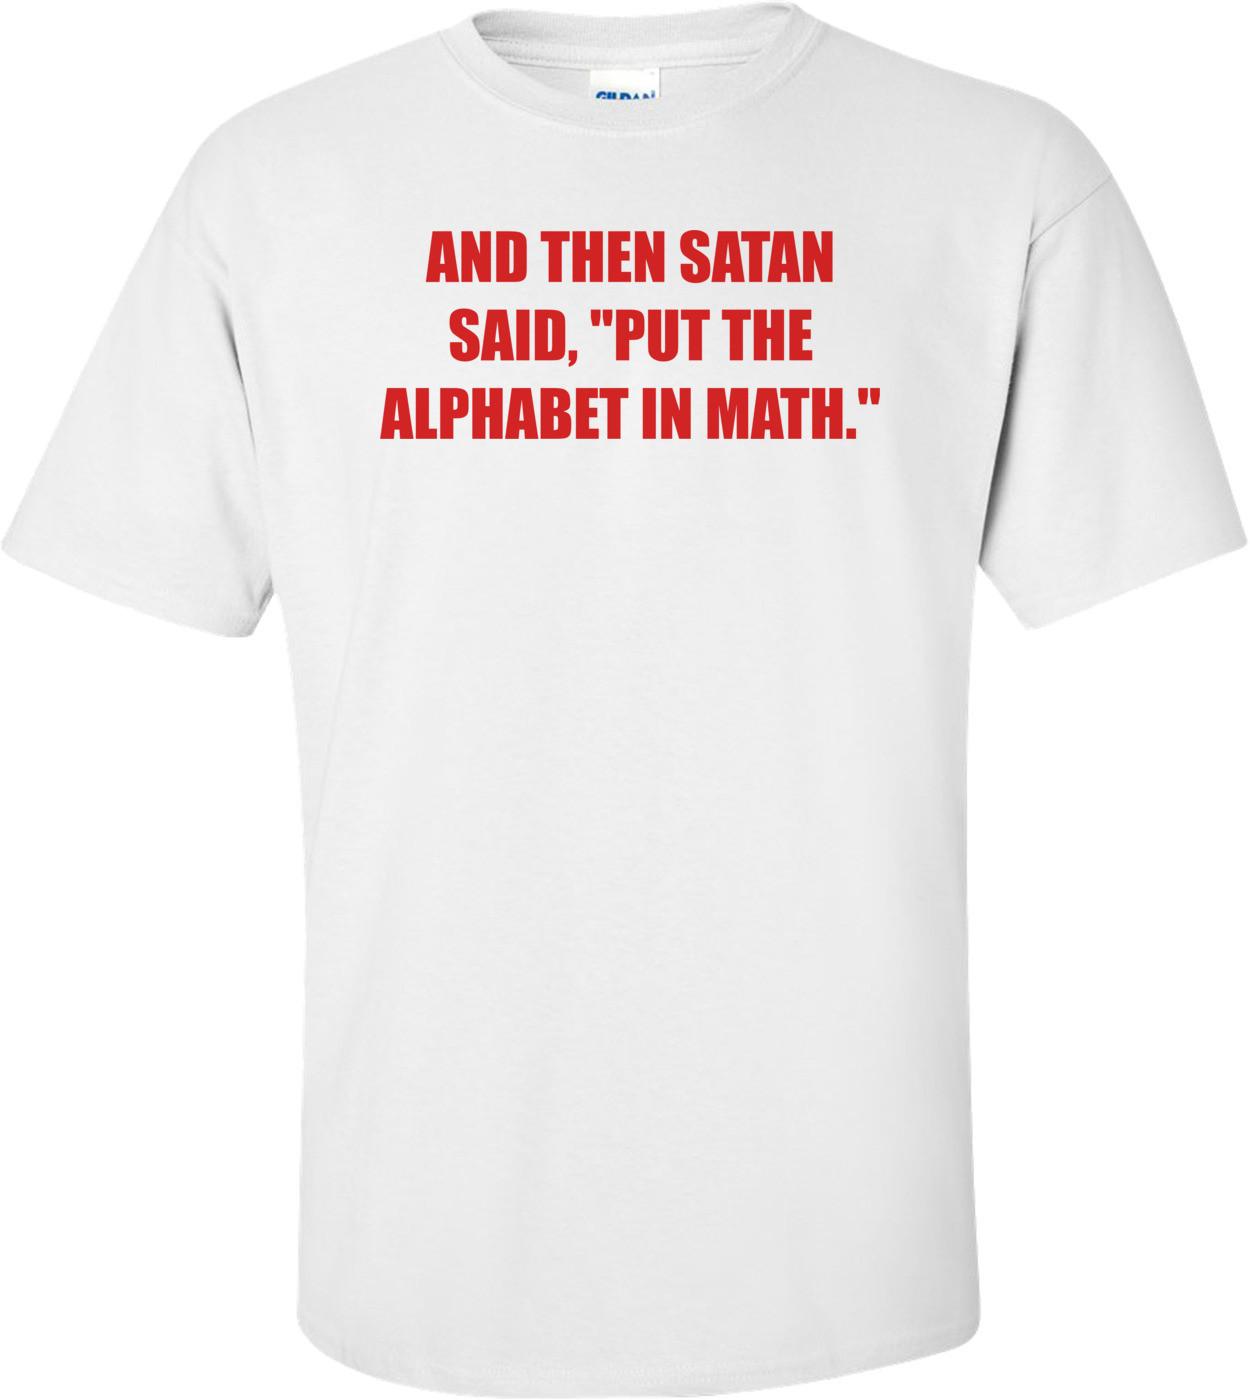 "AND THEN SATAN SAID, ""PUT THE ALPHABET IN MATH."" Shirt"